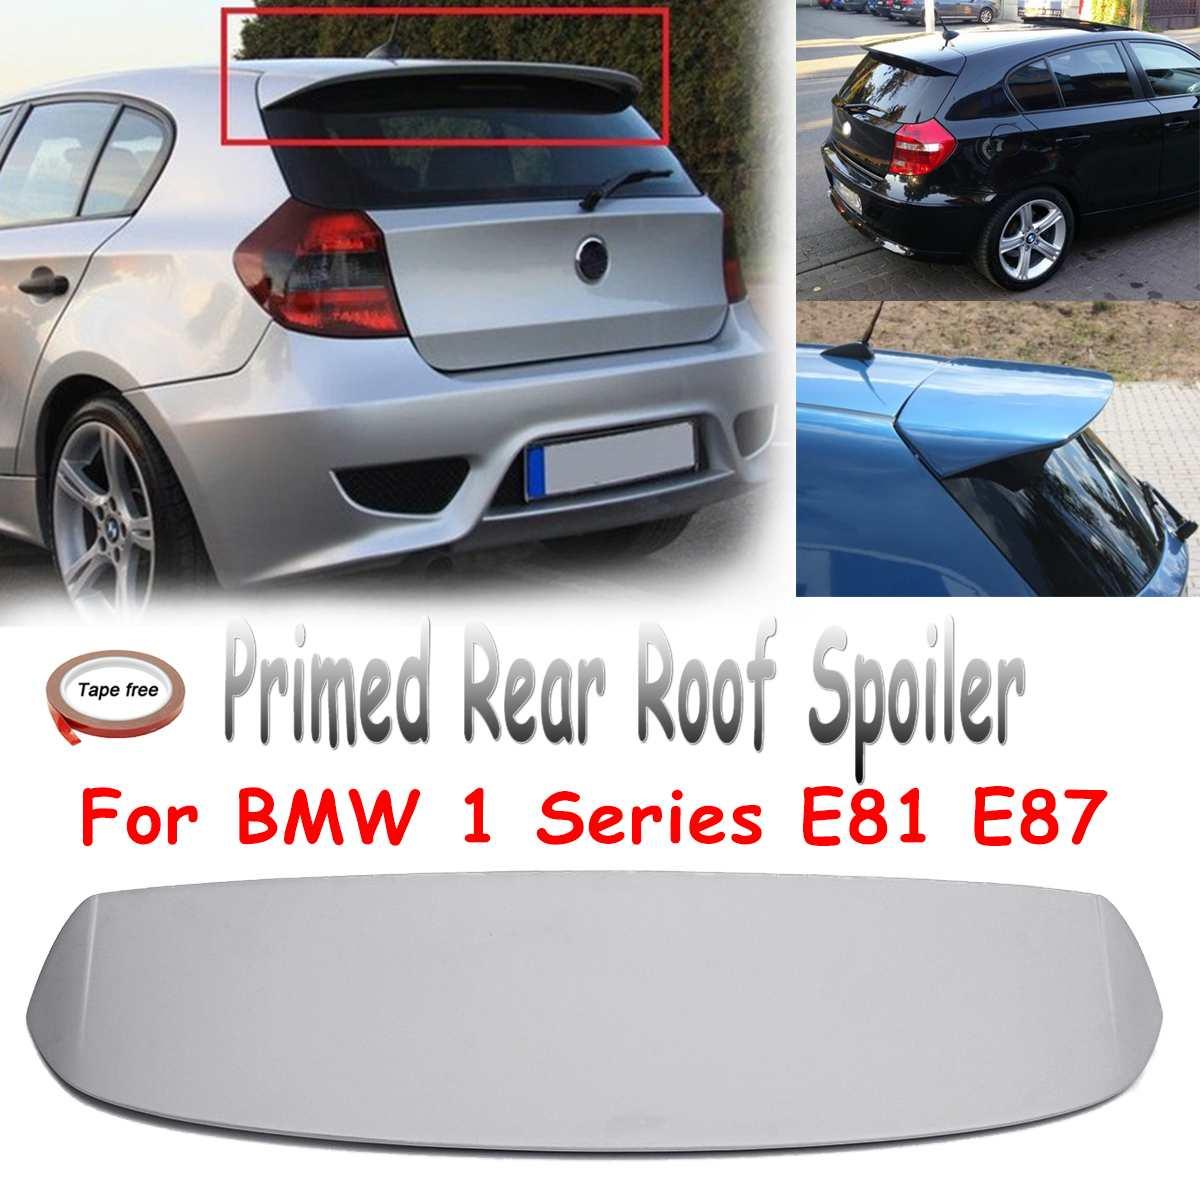 Alerón trasero sin pintar, alerón trasero para techo de maletero, alerón de fibra de vidrio apto para BMW serie 1 E81 E87 FRP